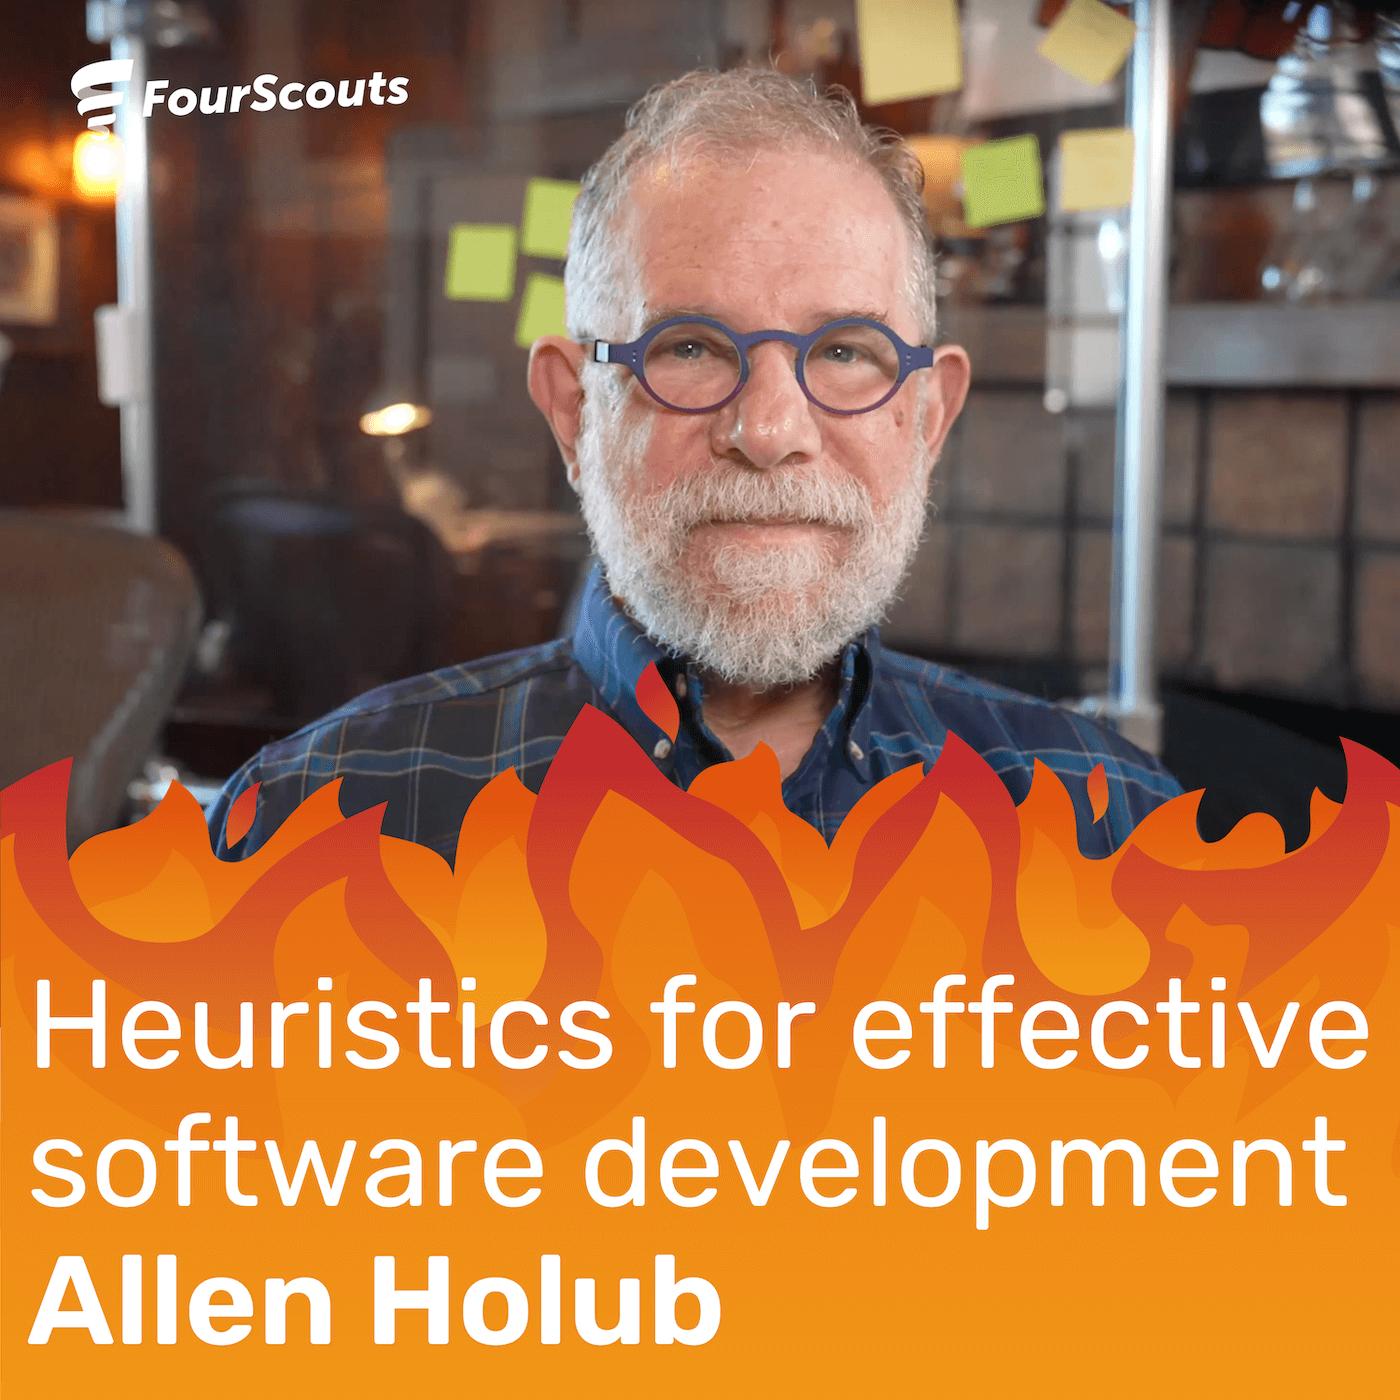 Heuristics for effective software development with Allen Holub